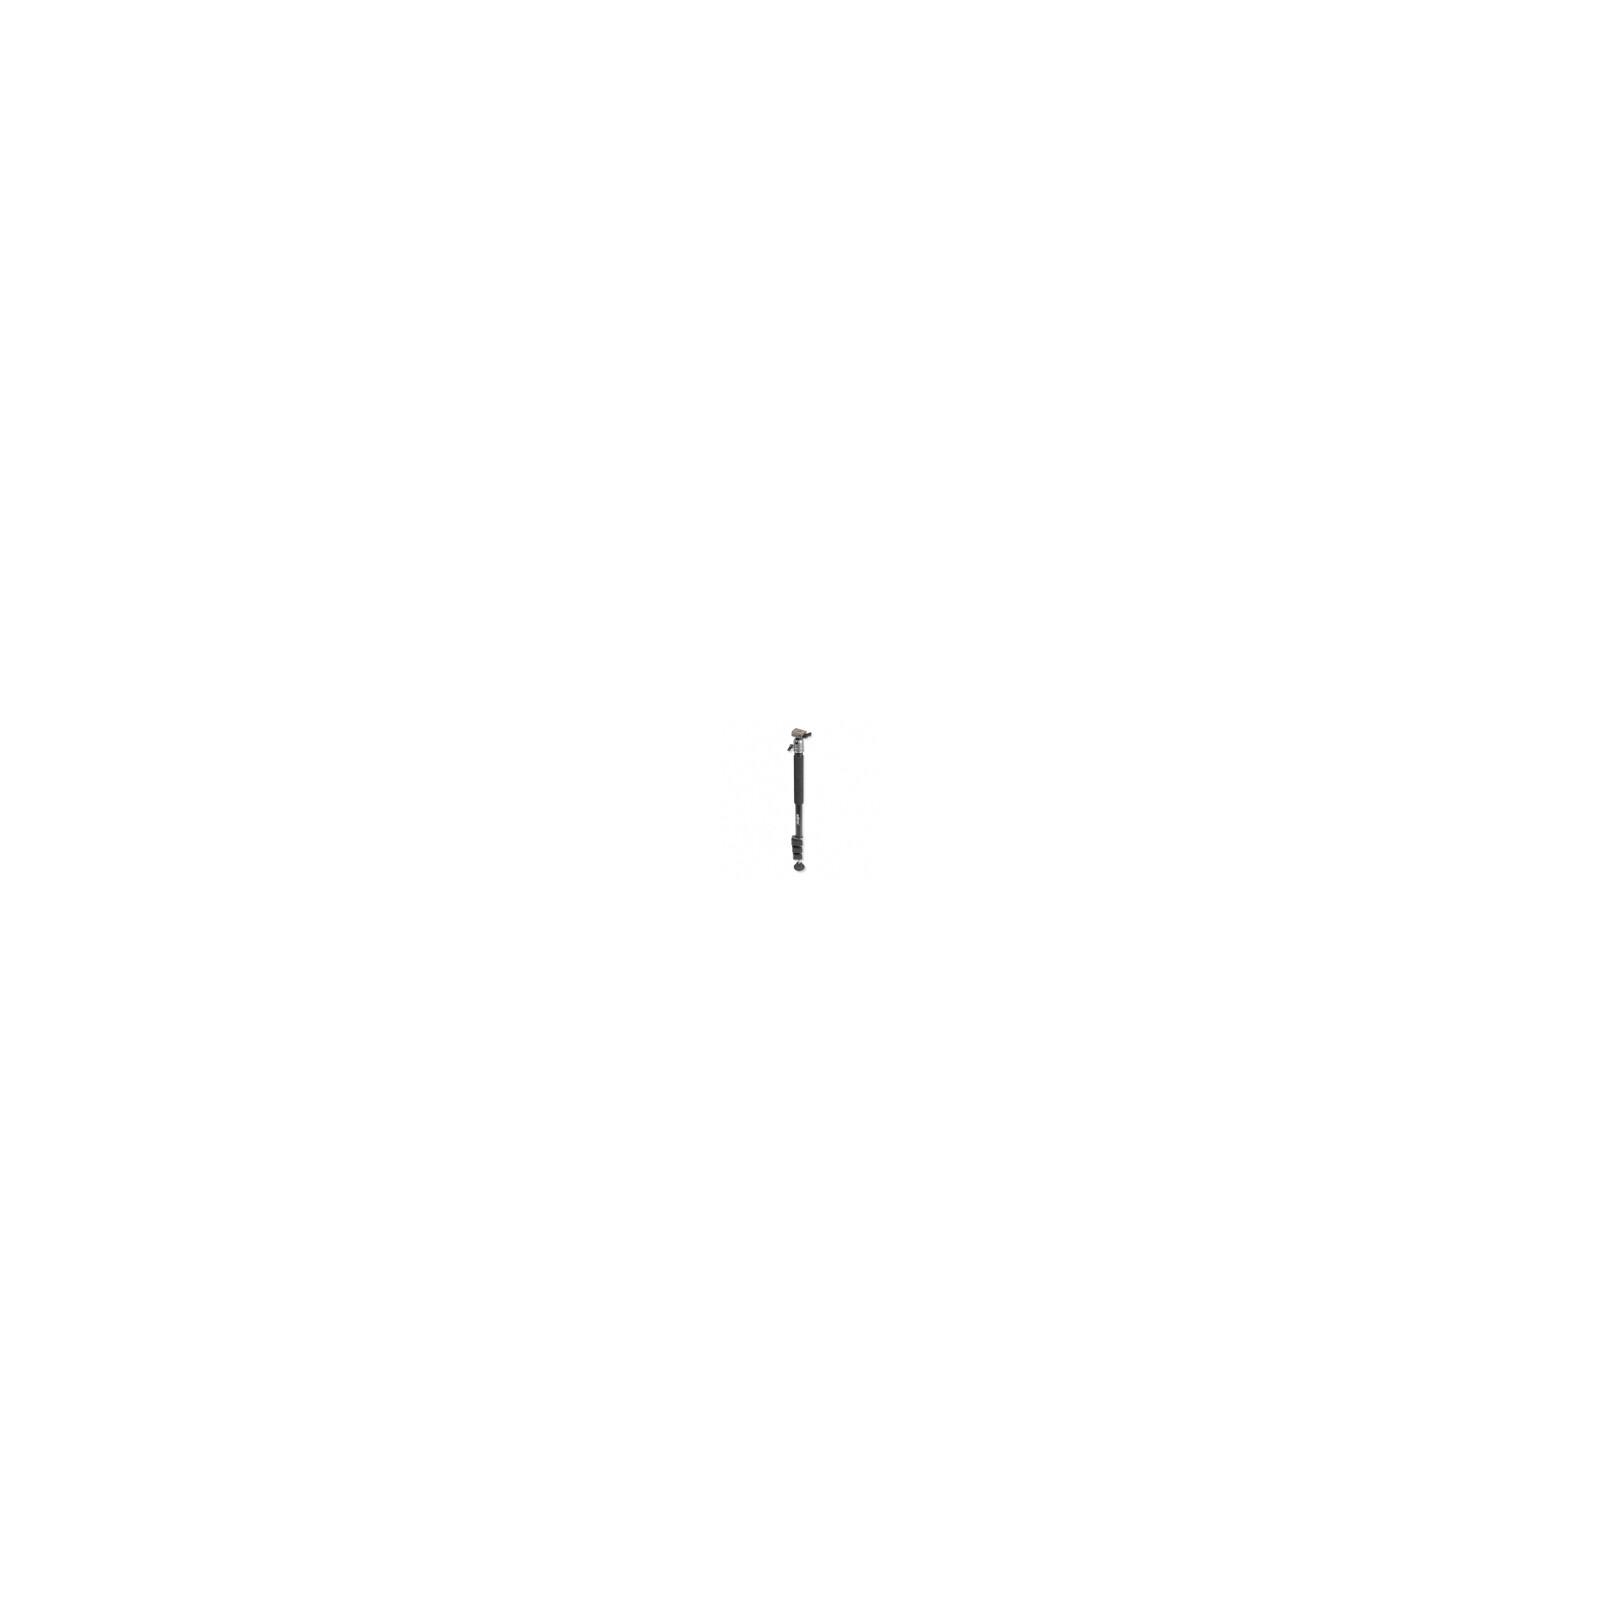 walimex pro FW-560 Alu-Pro Einbeinstativ + Kopf